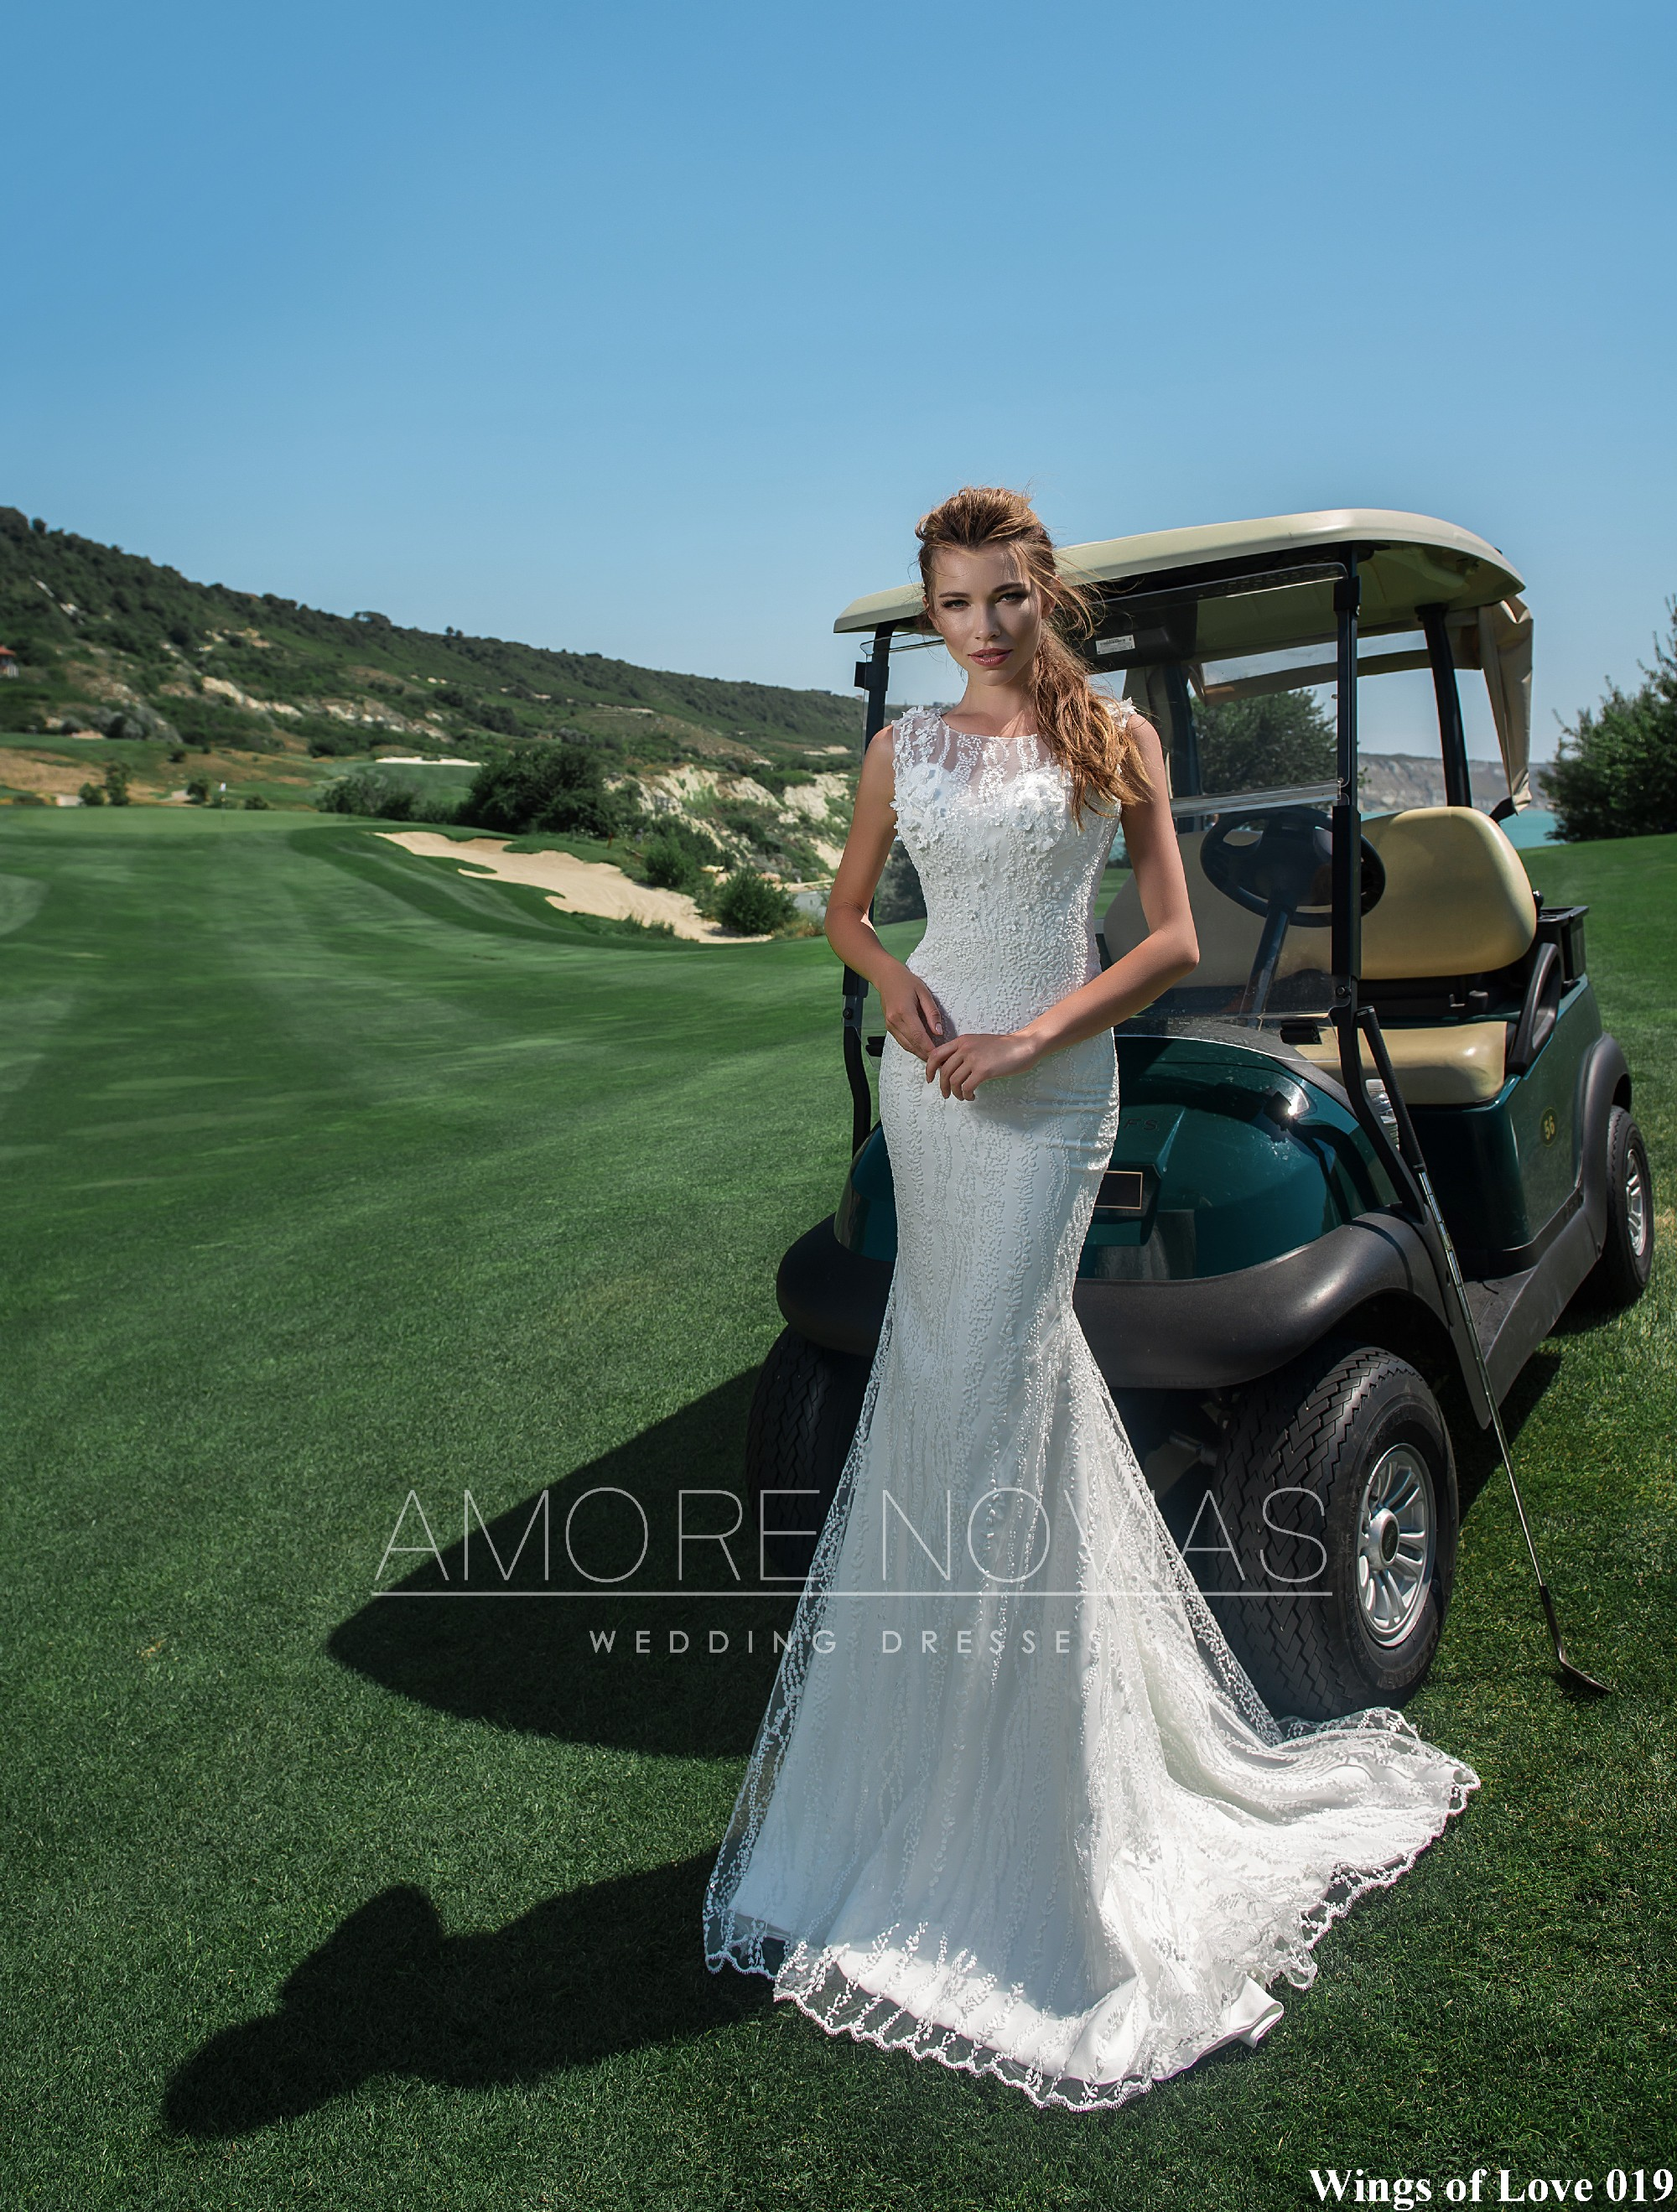 http://amore-novias.com/images/stories/virtuemart/product/lk-019-------(1).jpg